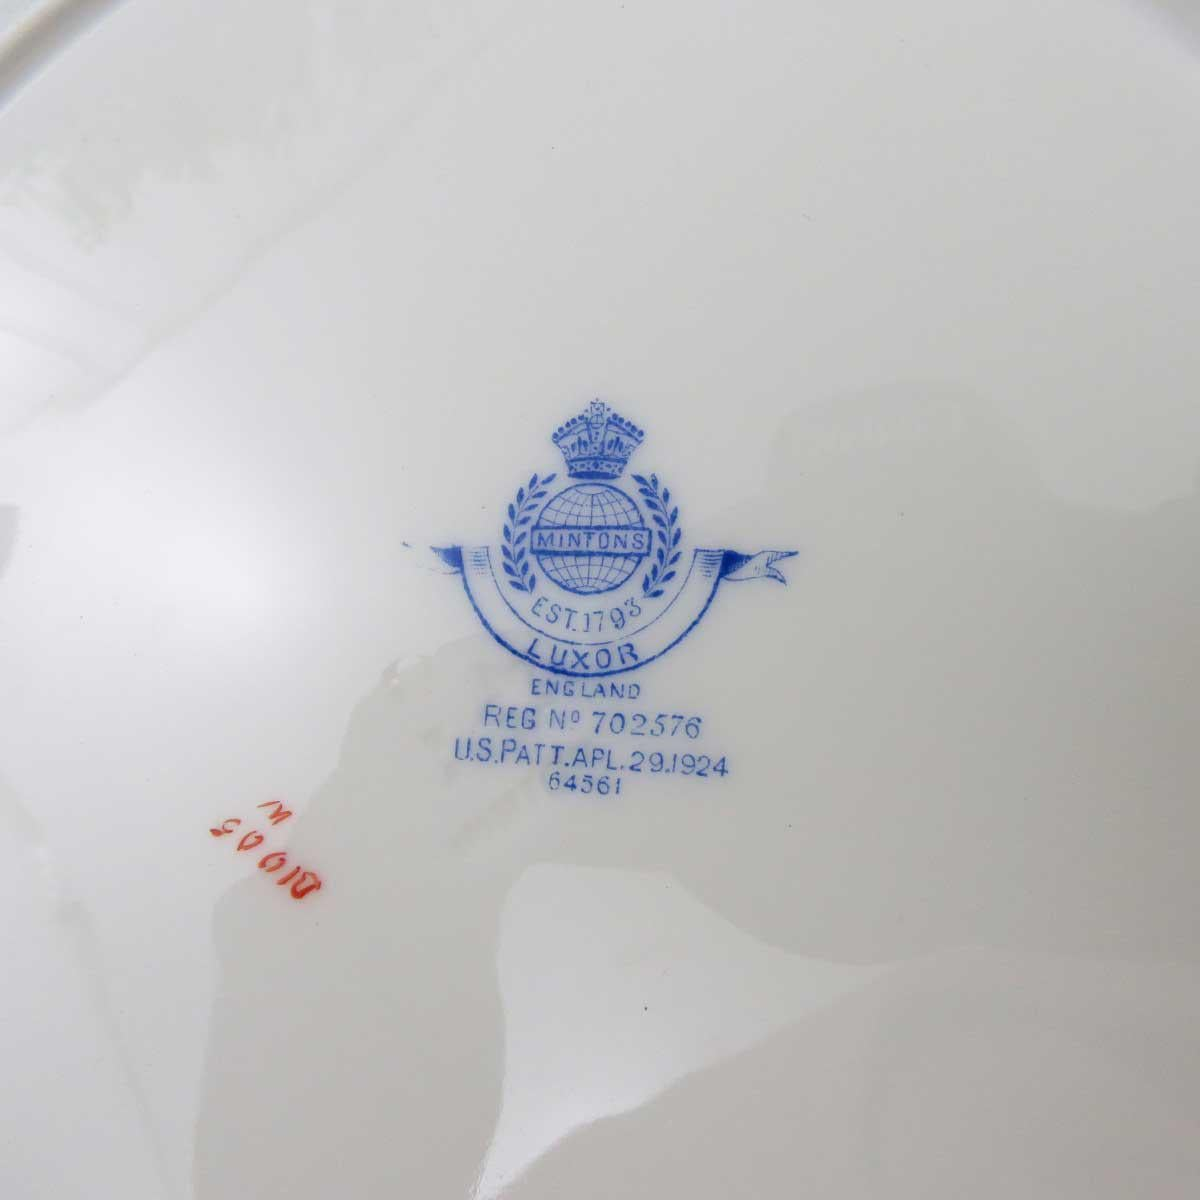 Vintage Mismatched Fine China Dinner Plates - Set of 4 - Image 7 of 11 & Vintage Mismatched Fine China Dinner Plates - Set of 4 | Chairish